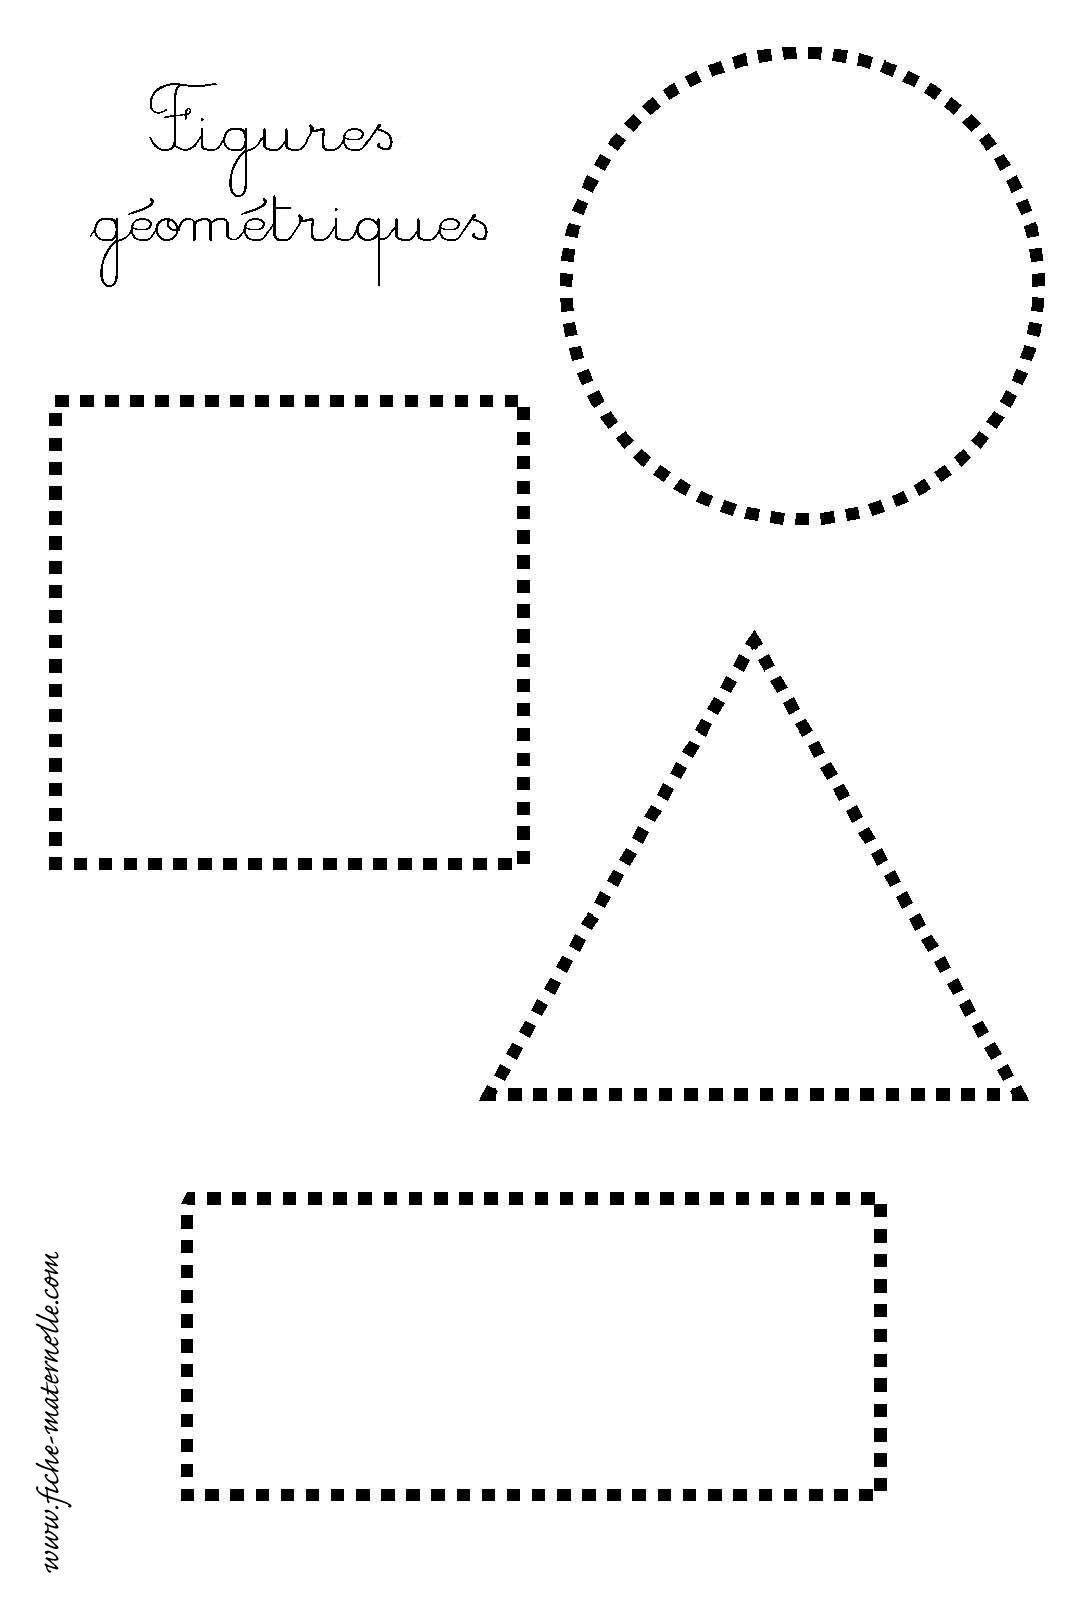 Per School On Triangle Worksheet